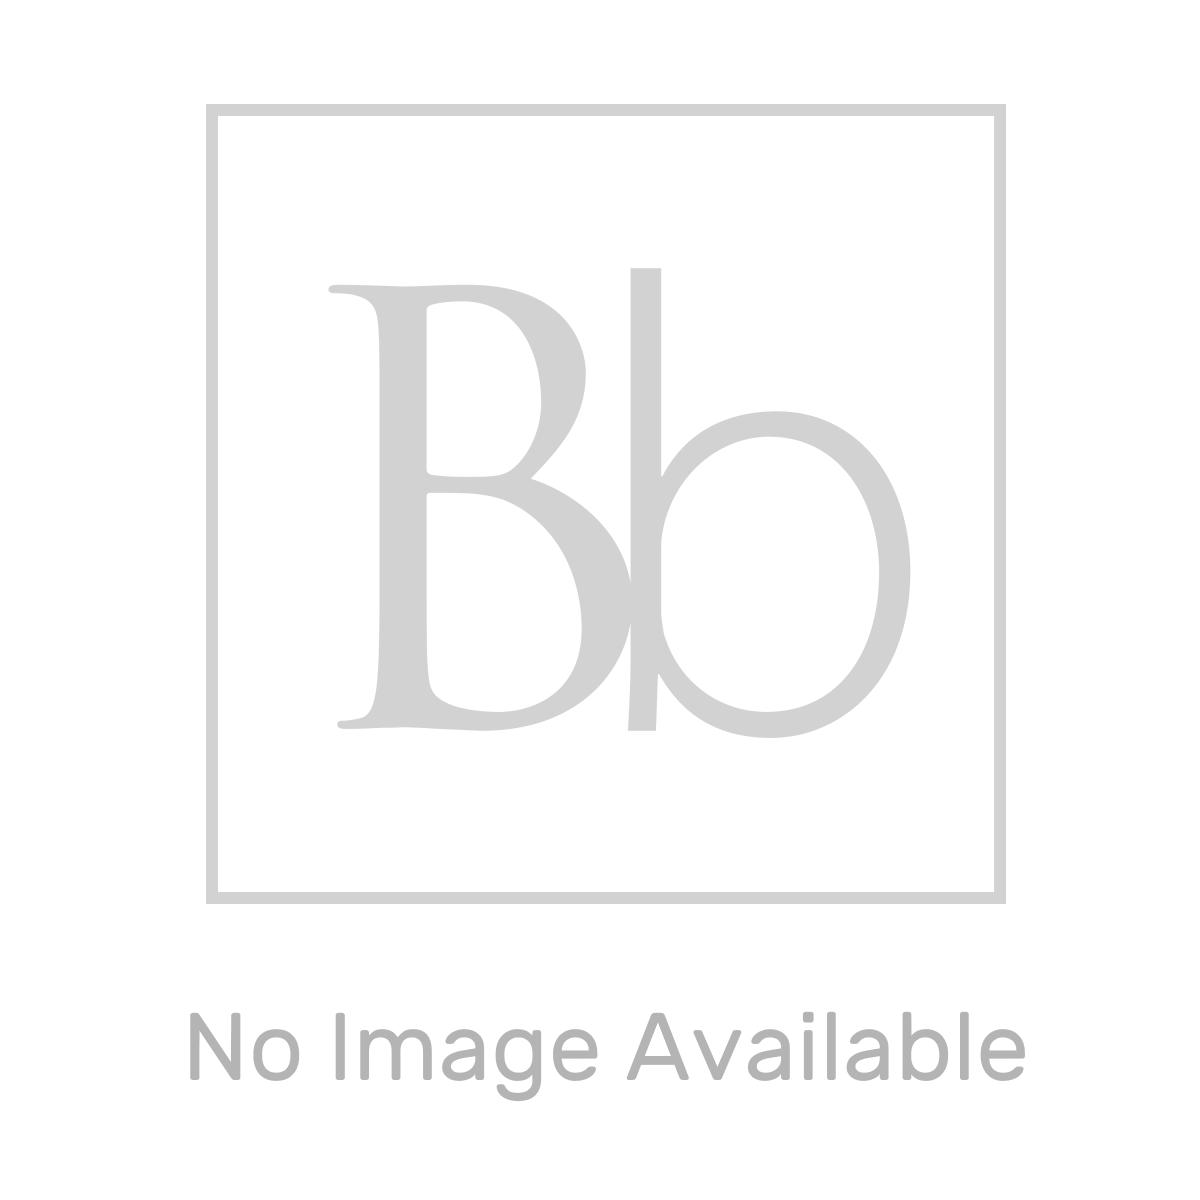 Tavistock Blaze Bath Shower Mixer Tap